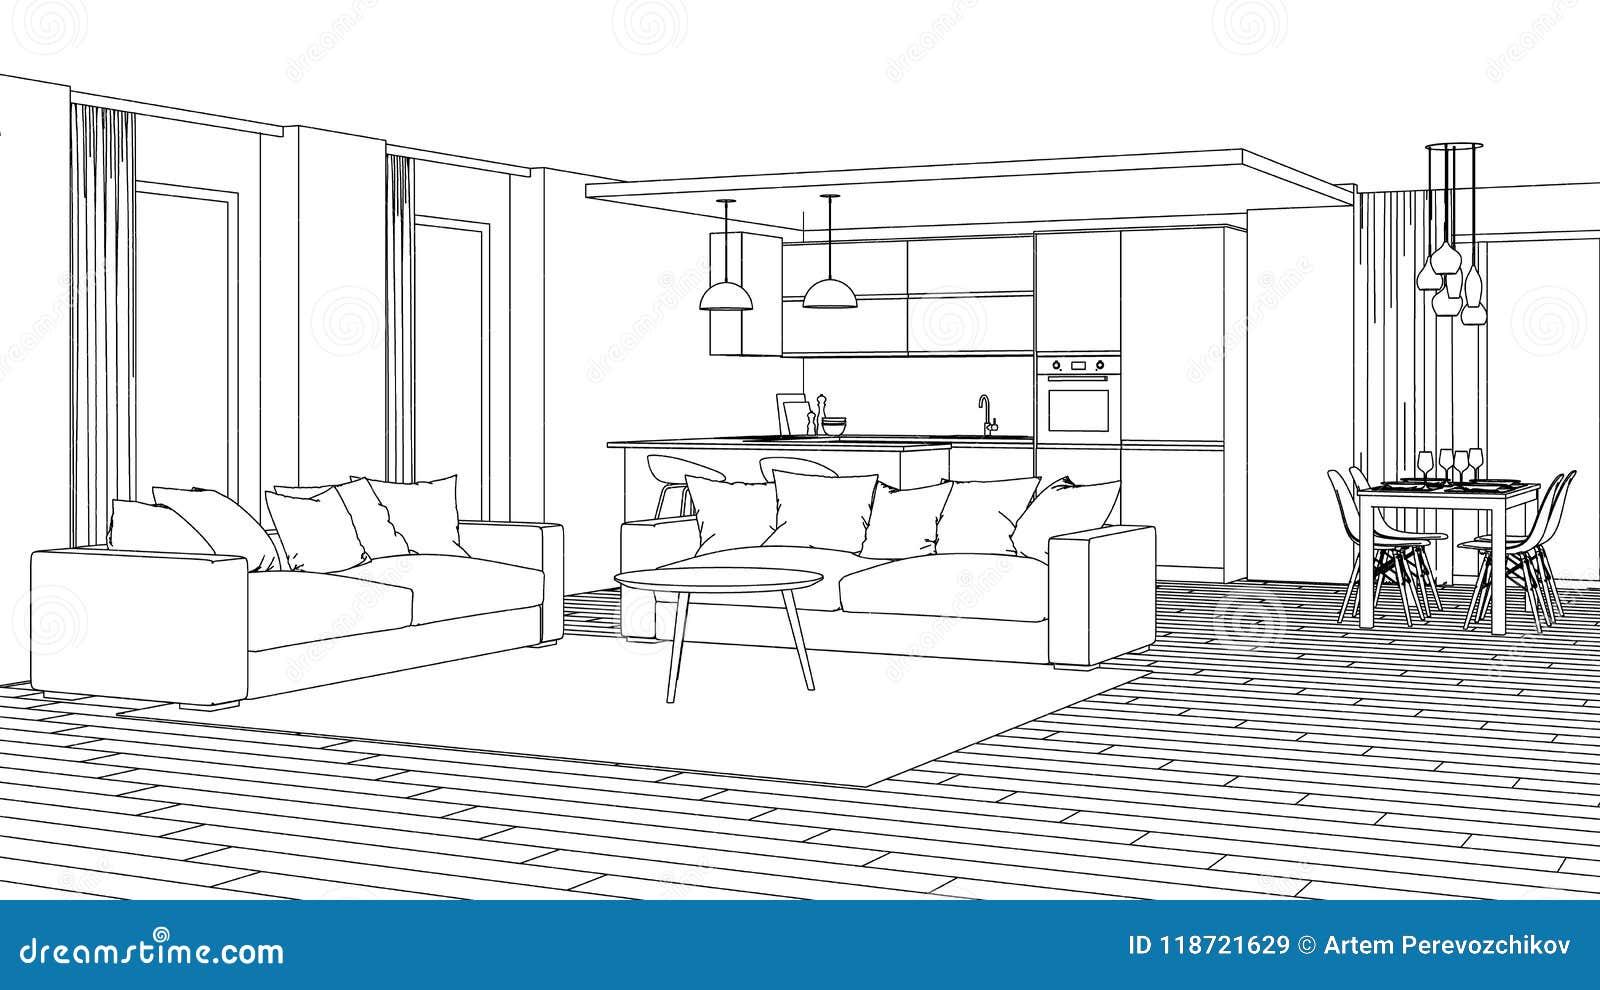 Modern house interior design project sketch